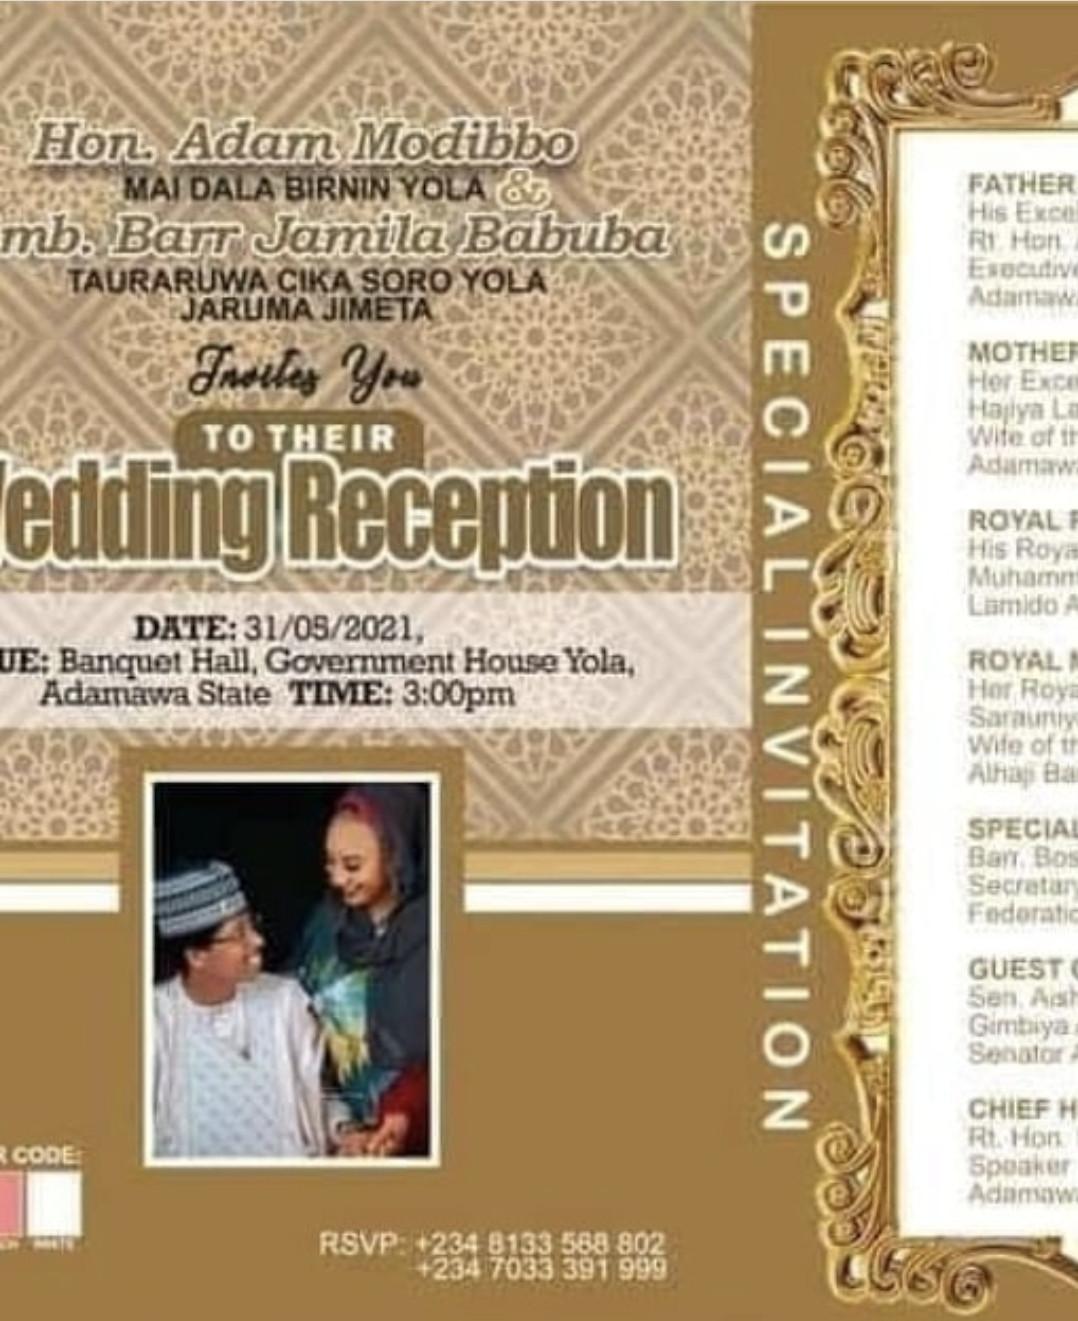 45-Year-Old Female Politician, Jamila Babuba Marries 23-Year-Old Man In Adamawa [Photos] 6